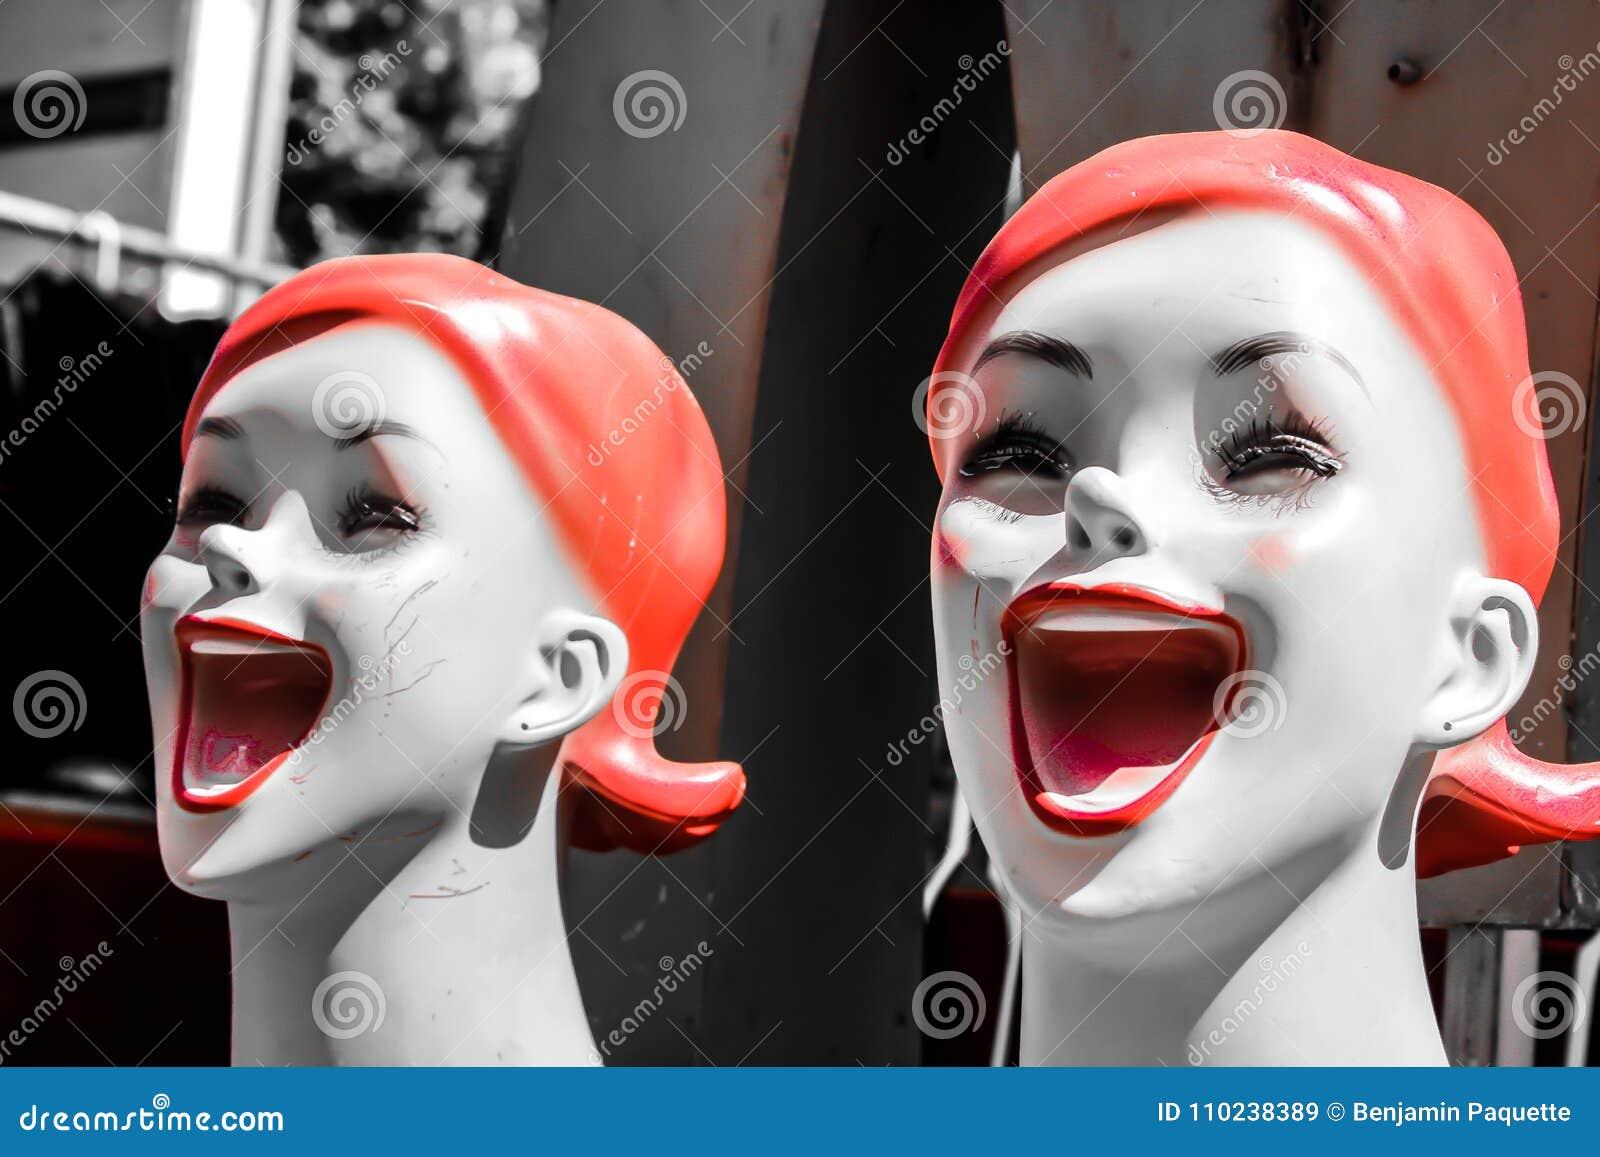 Szczęśliwe twarze na mannequins